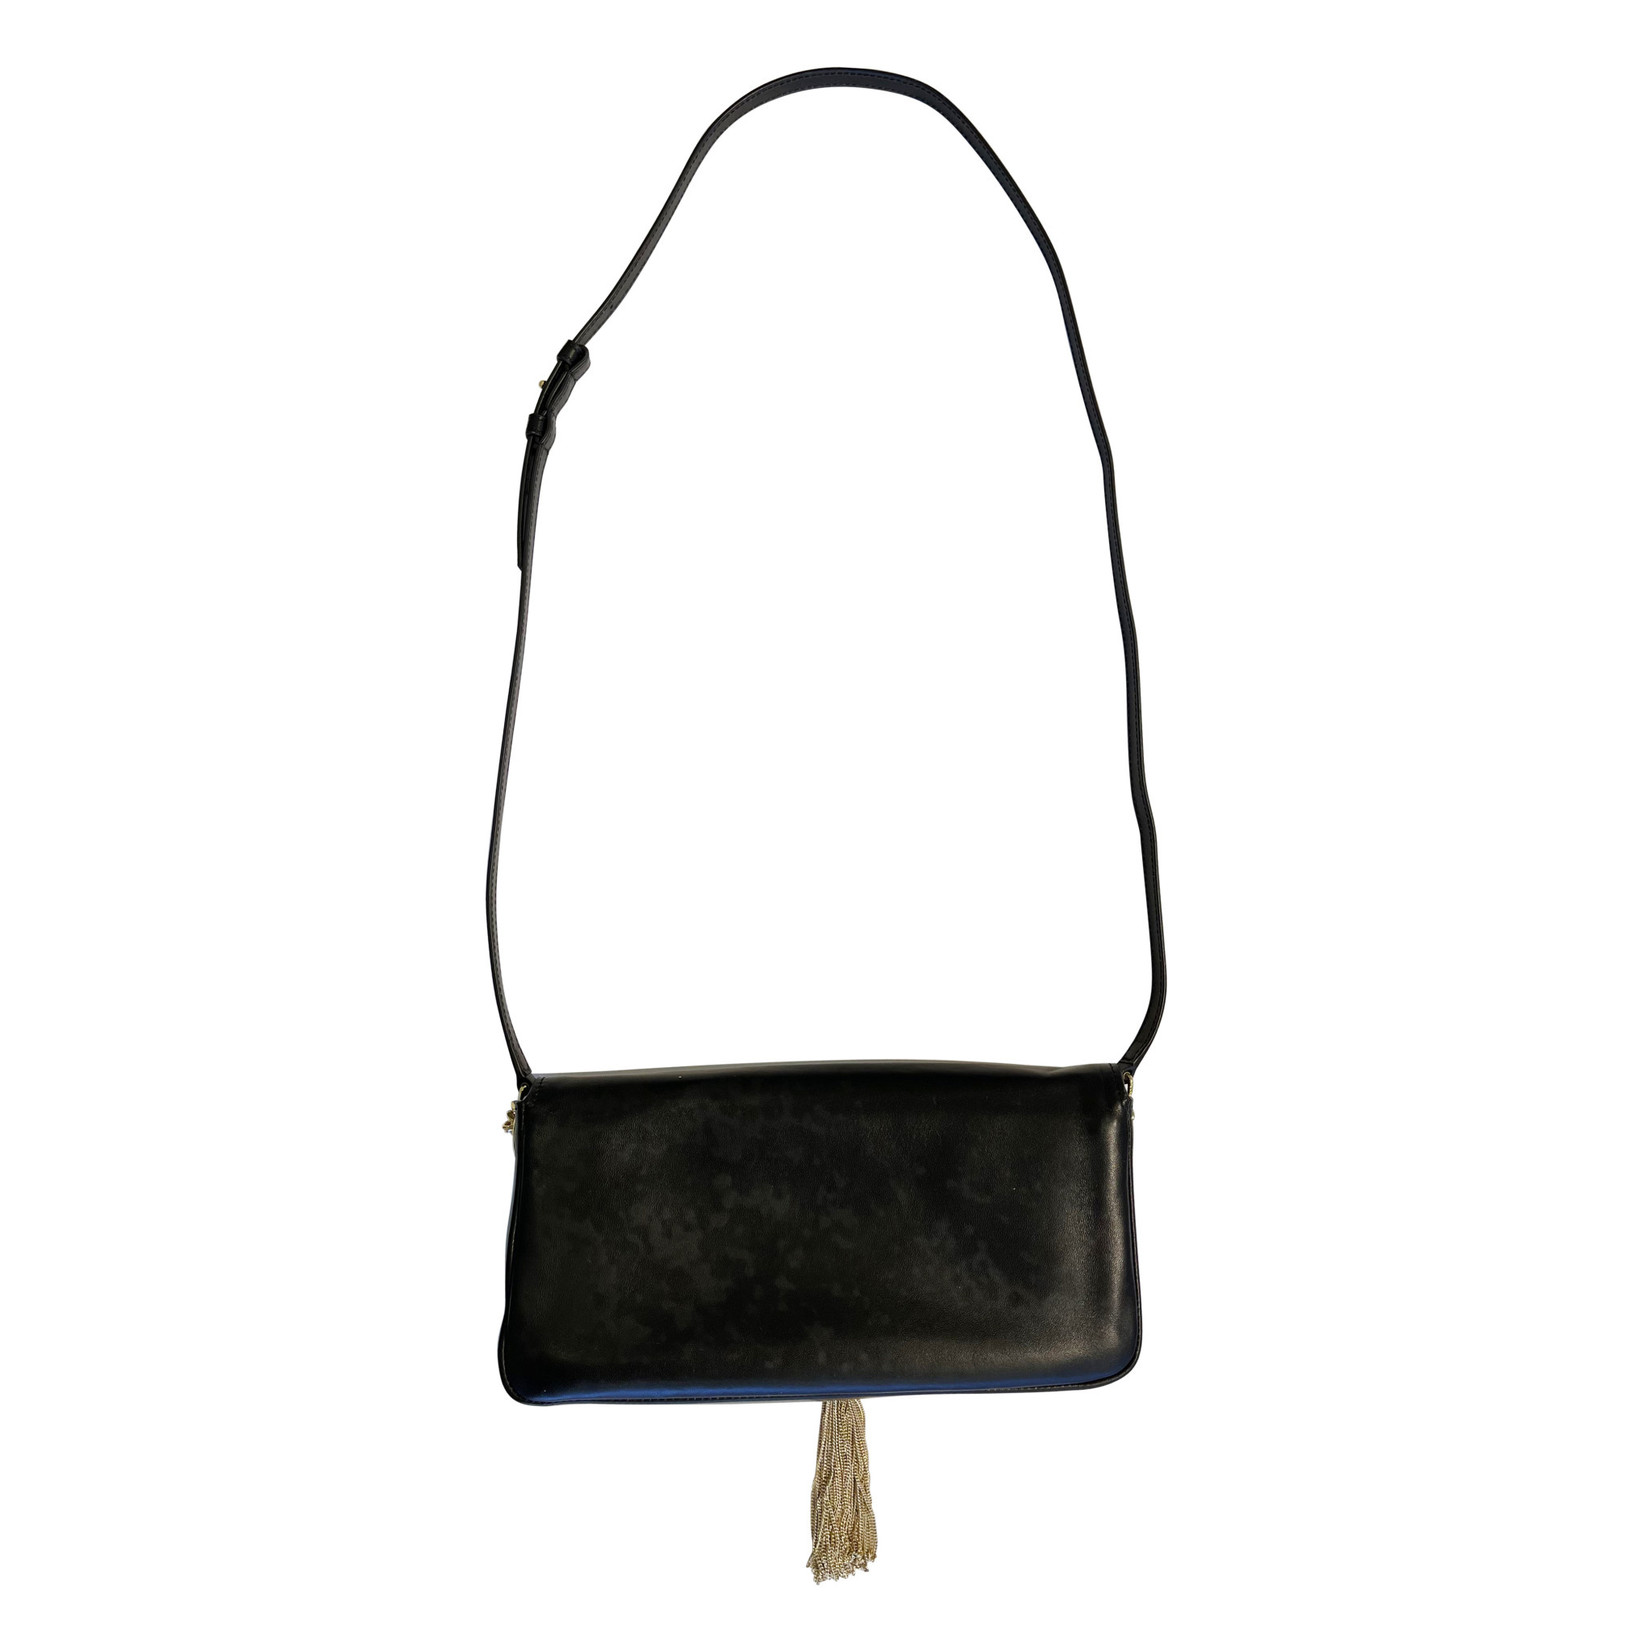 Wyld Blue Saint Laurent Tassel Bag